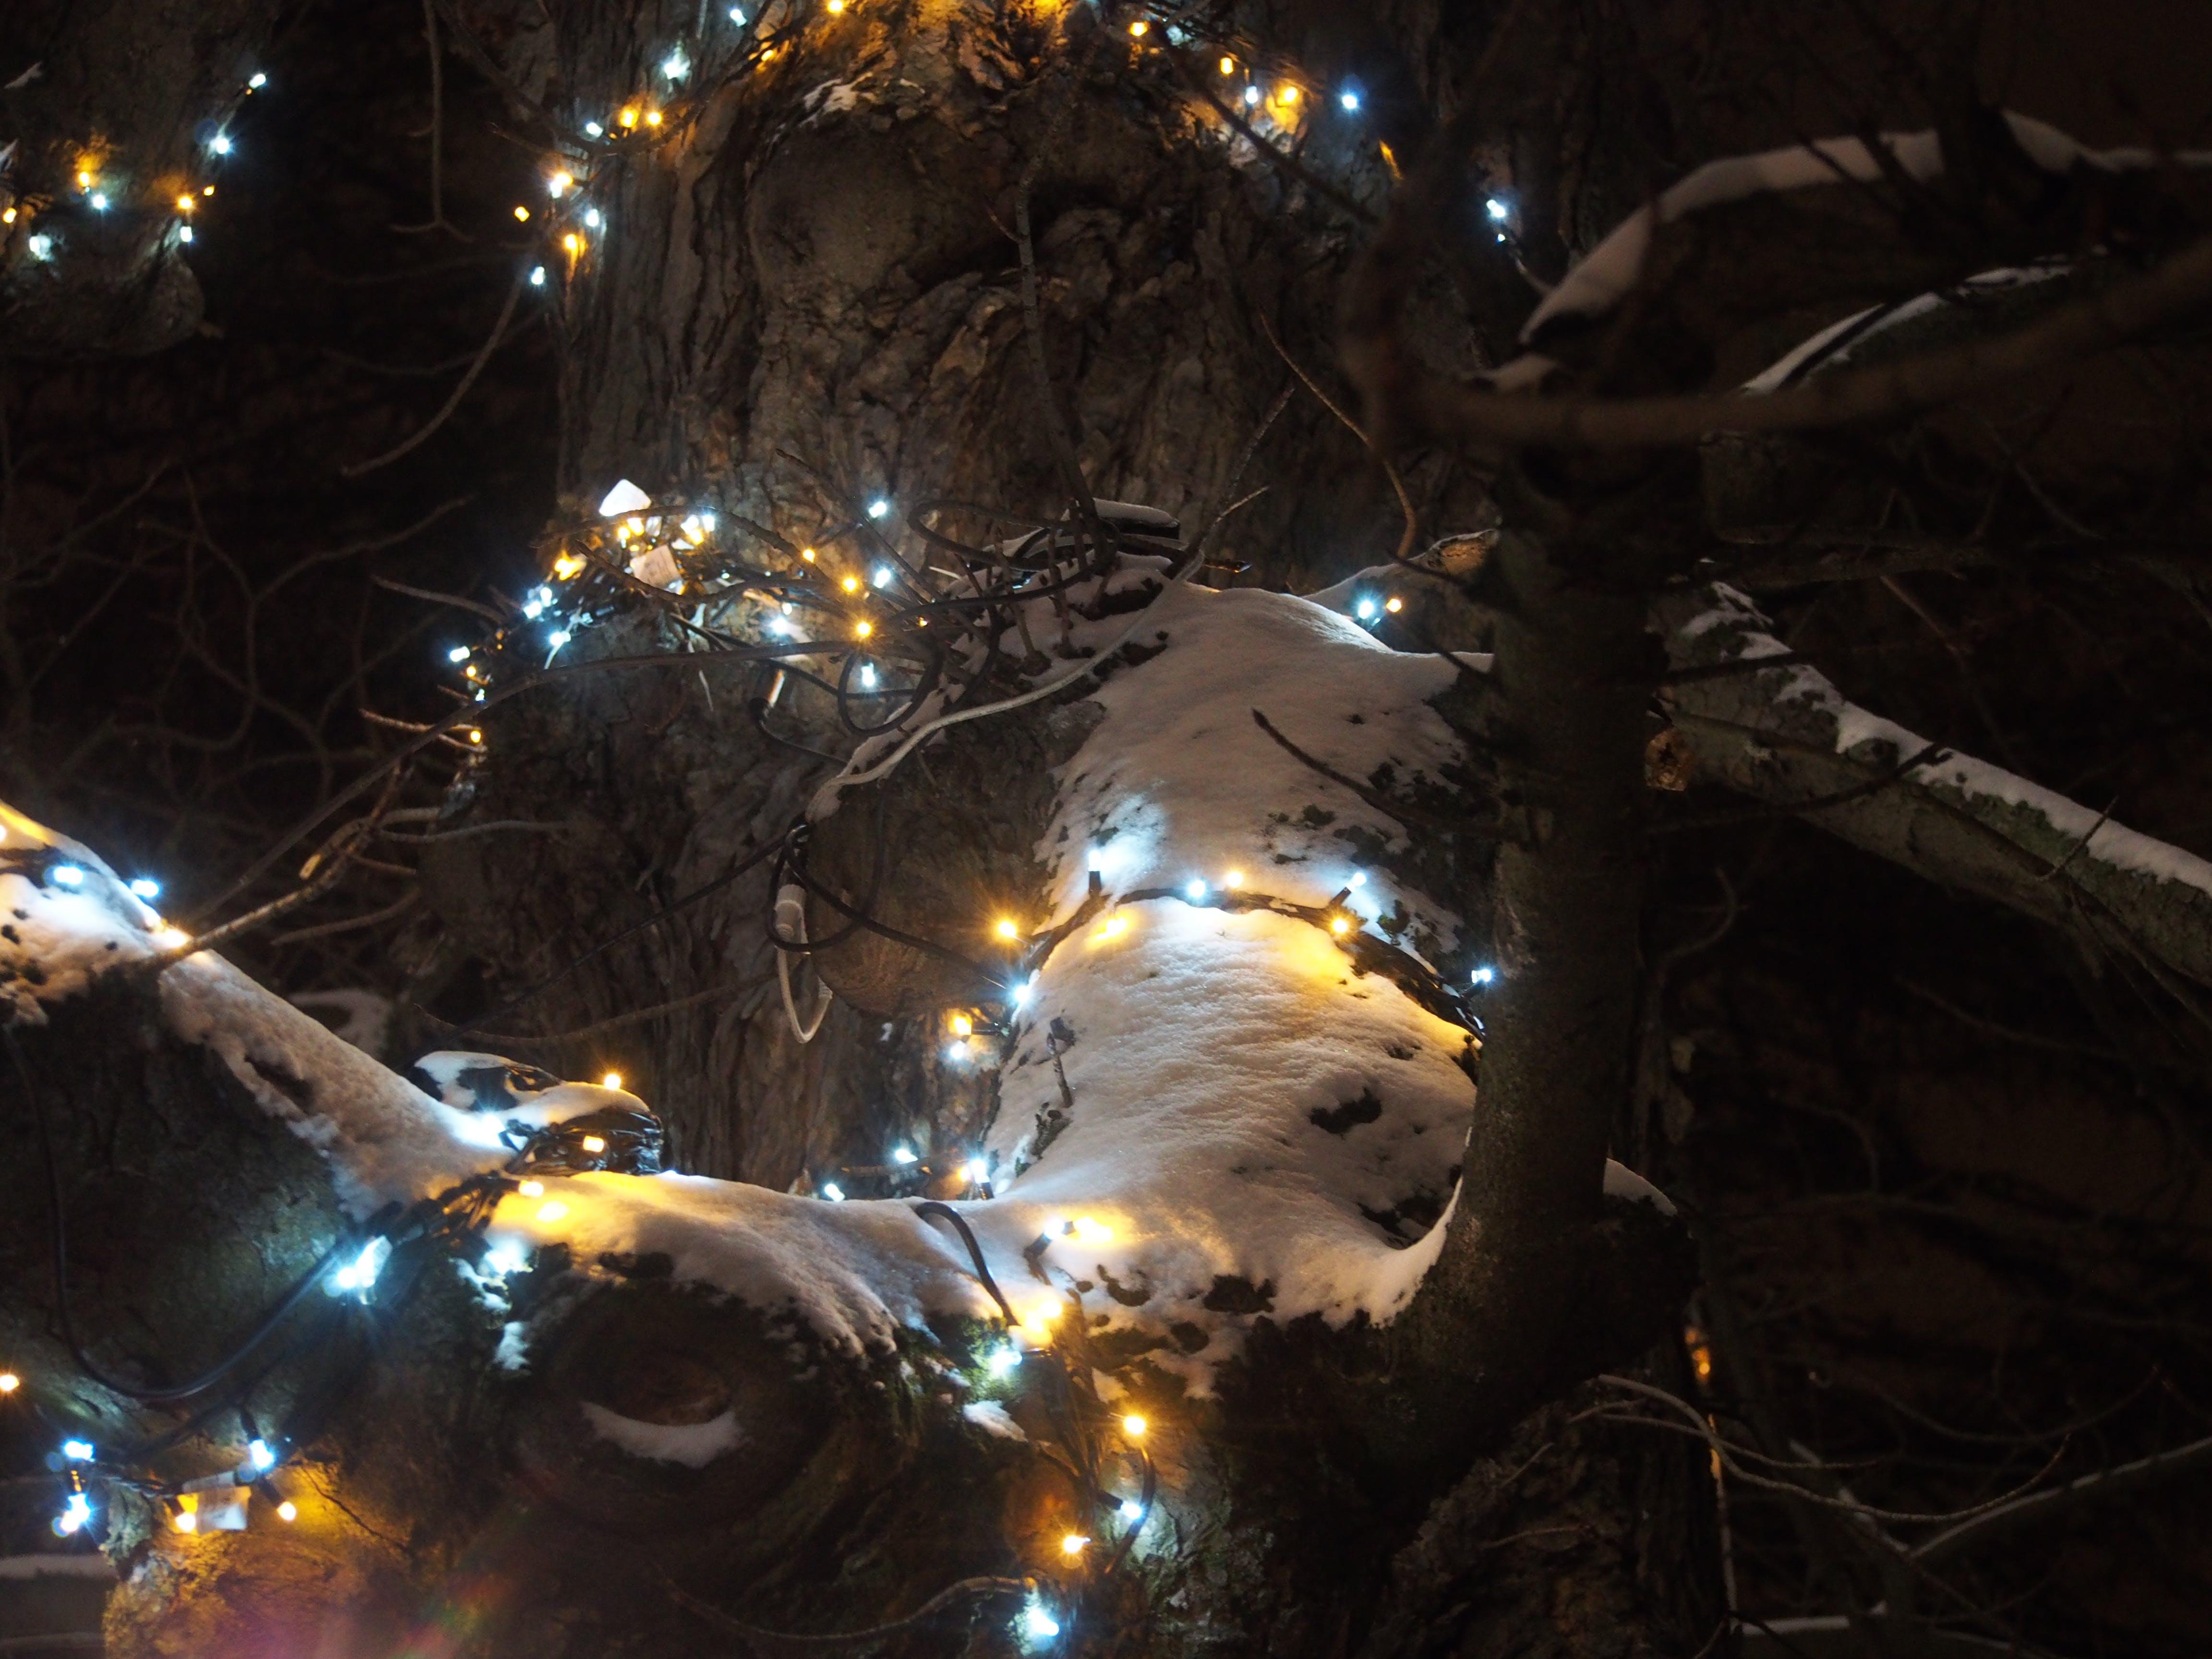 Free stock photo of #lights # tree # christmas